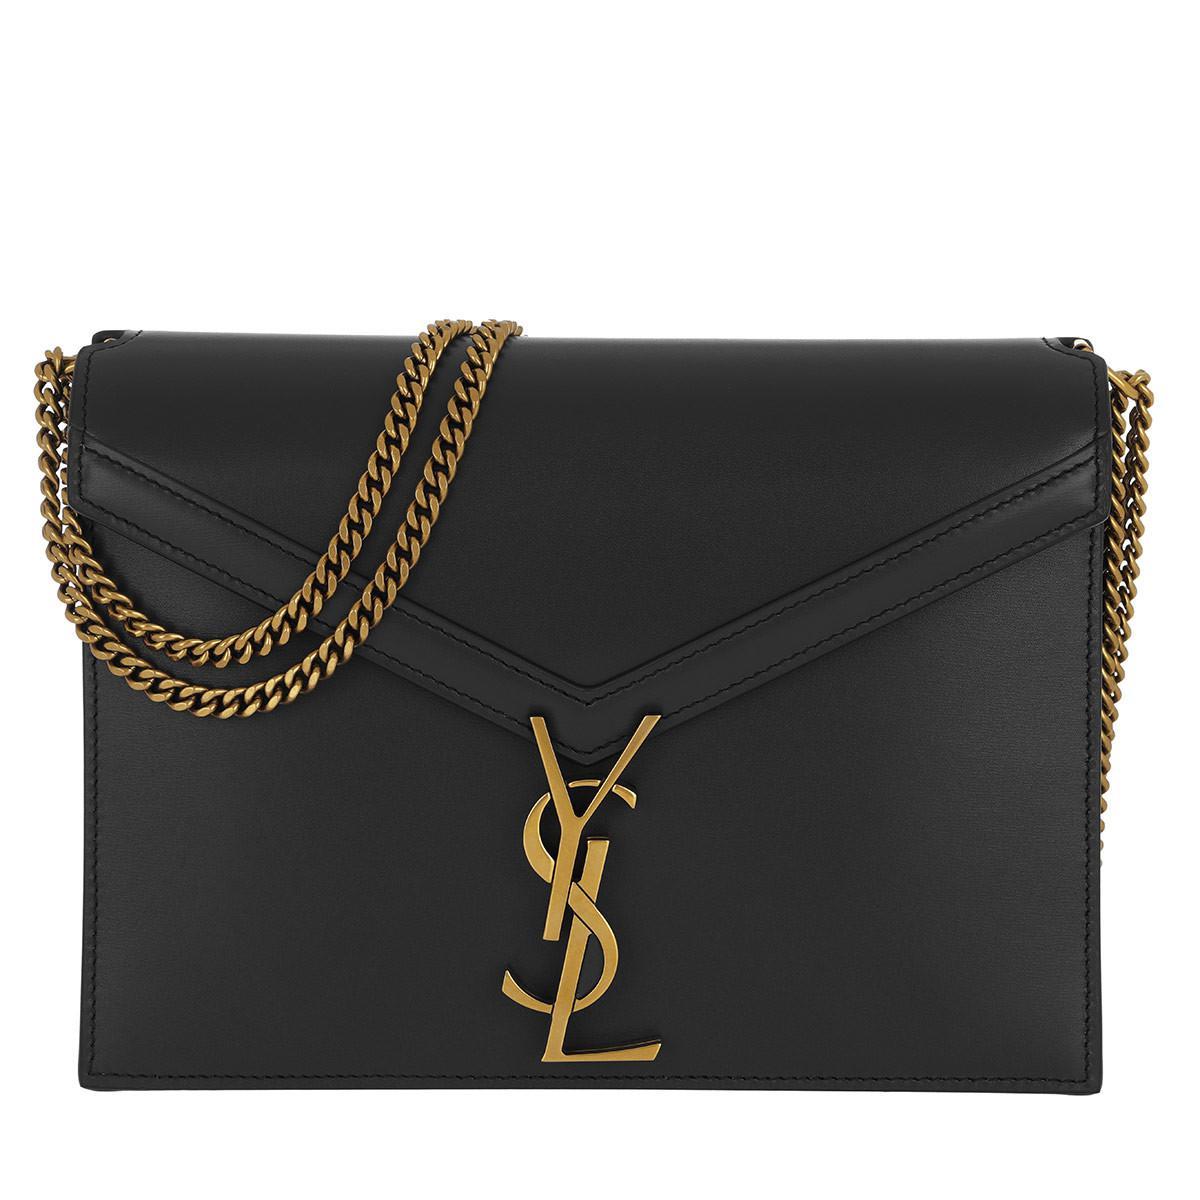 Saint Laurent Cassandra Monogramme Chain Bag Leather Black in Black ... cdb223885dfc6